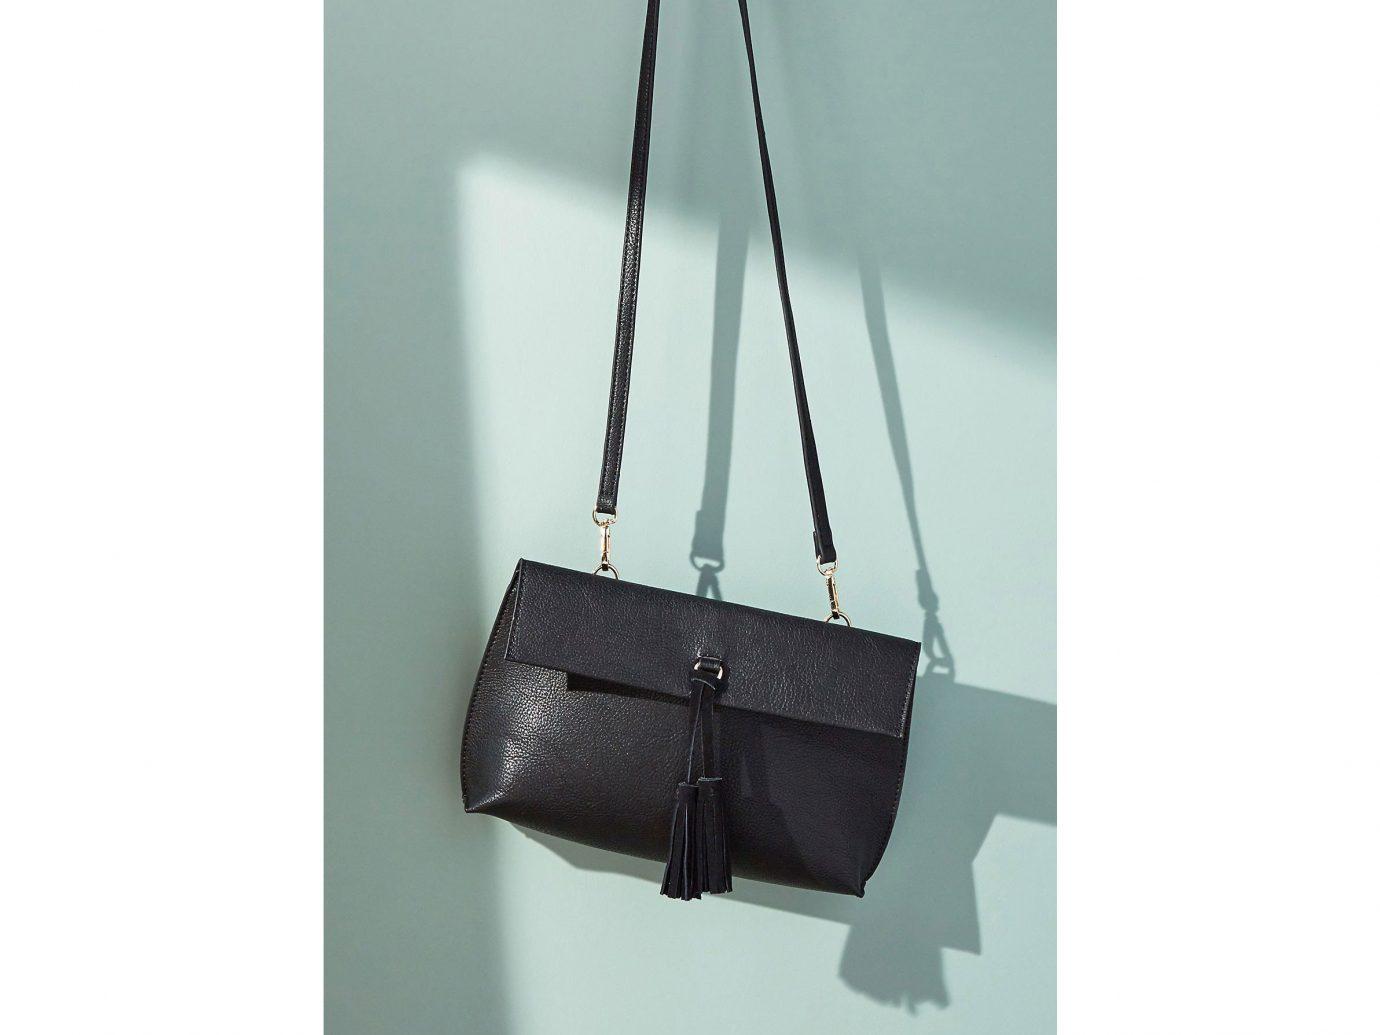 City NYC Style + Design Travel Shop bag wall indoor handbag shoulder bag product black product design leather accessory